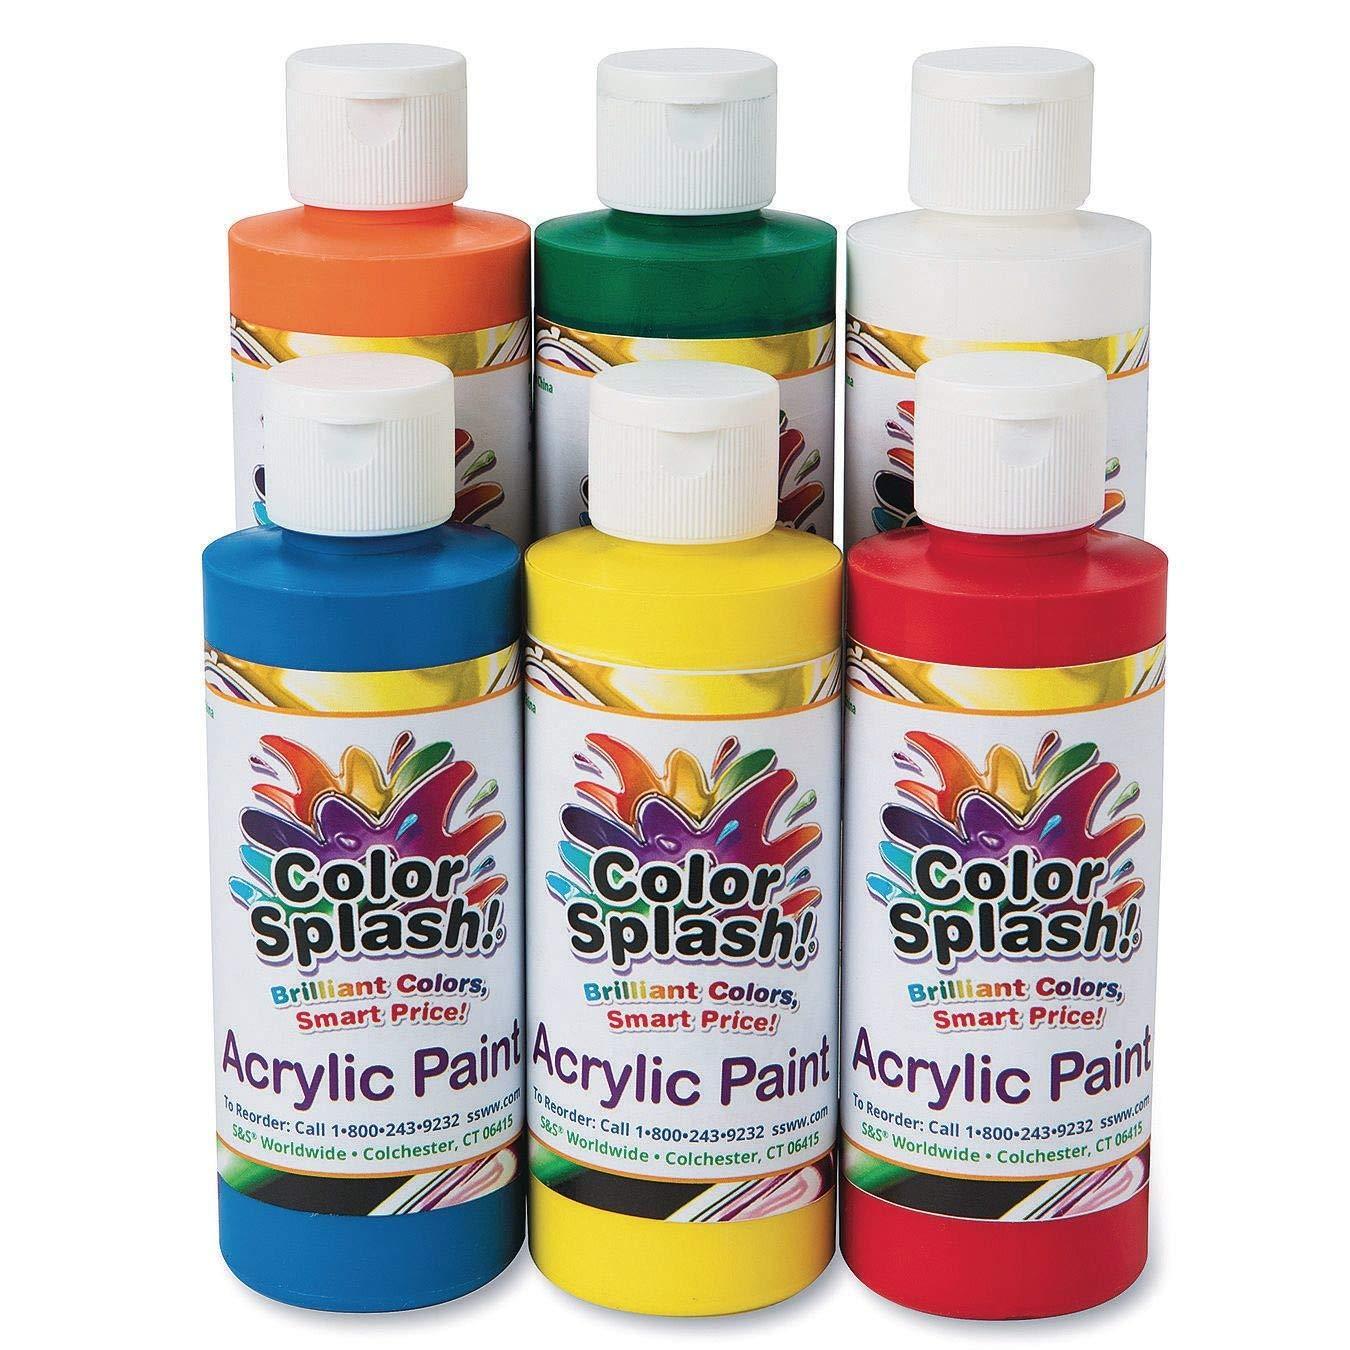 S&S Worldwide 8-oz. Color Splash! Acrylic Paint Assortment (Set of 6)